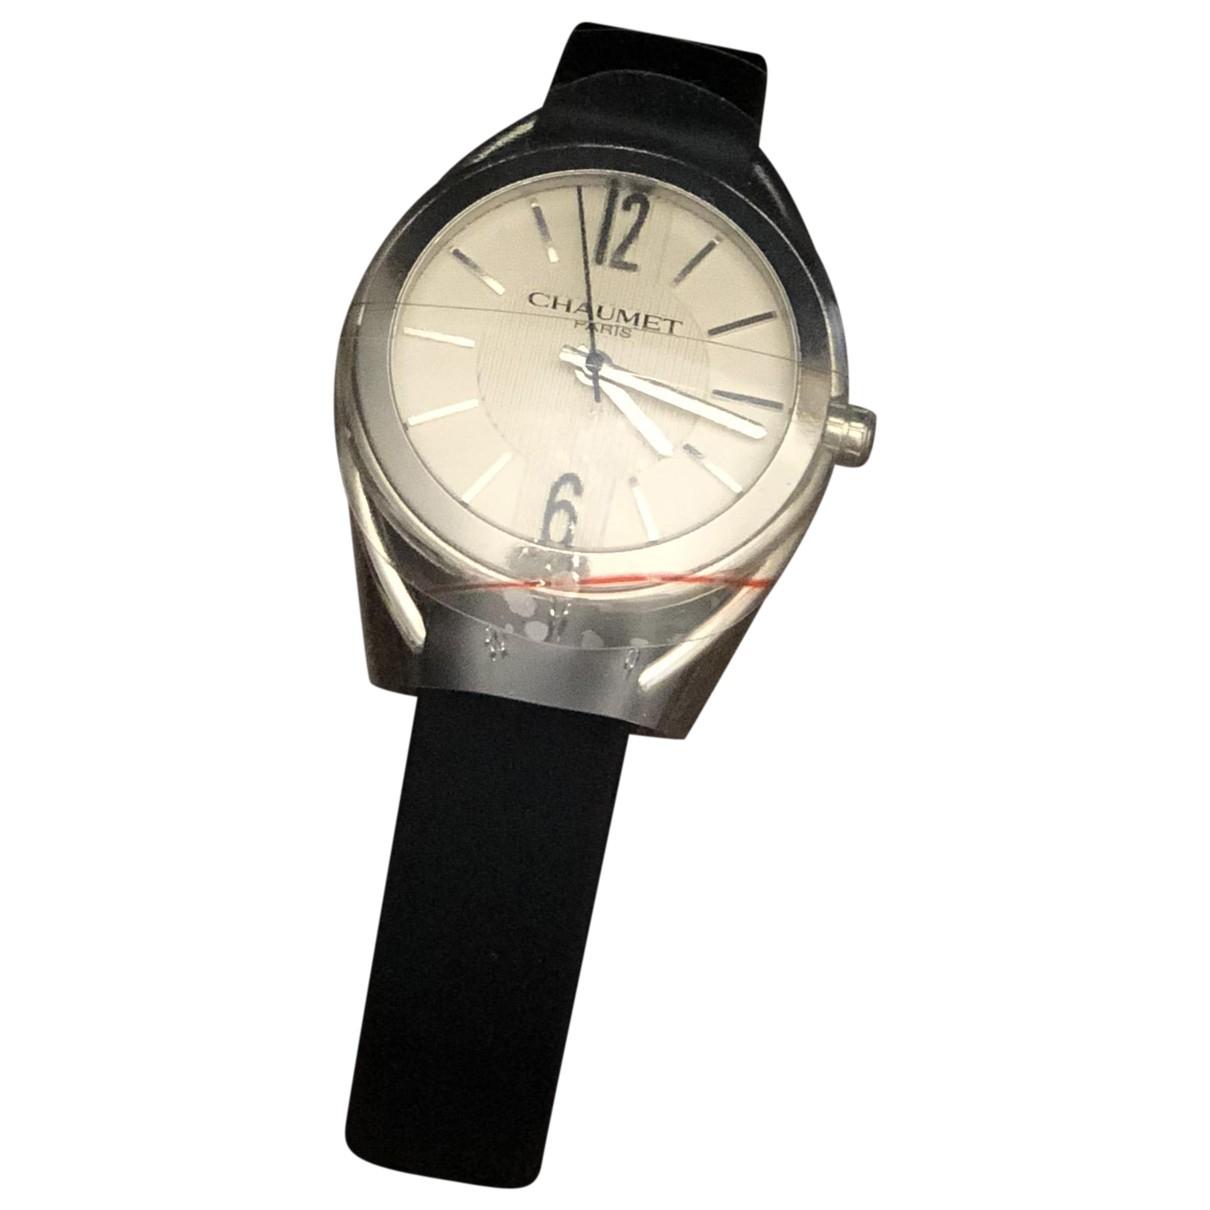 Chaumet \N Uhr in  Silber Stahl